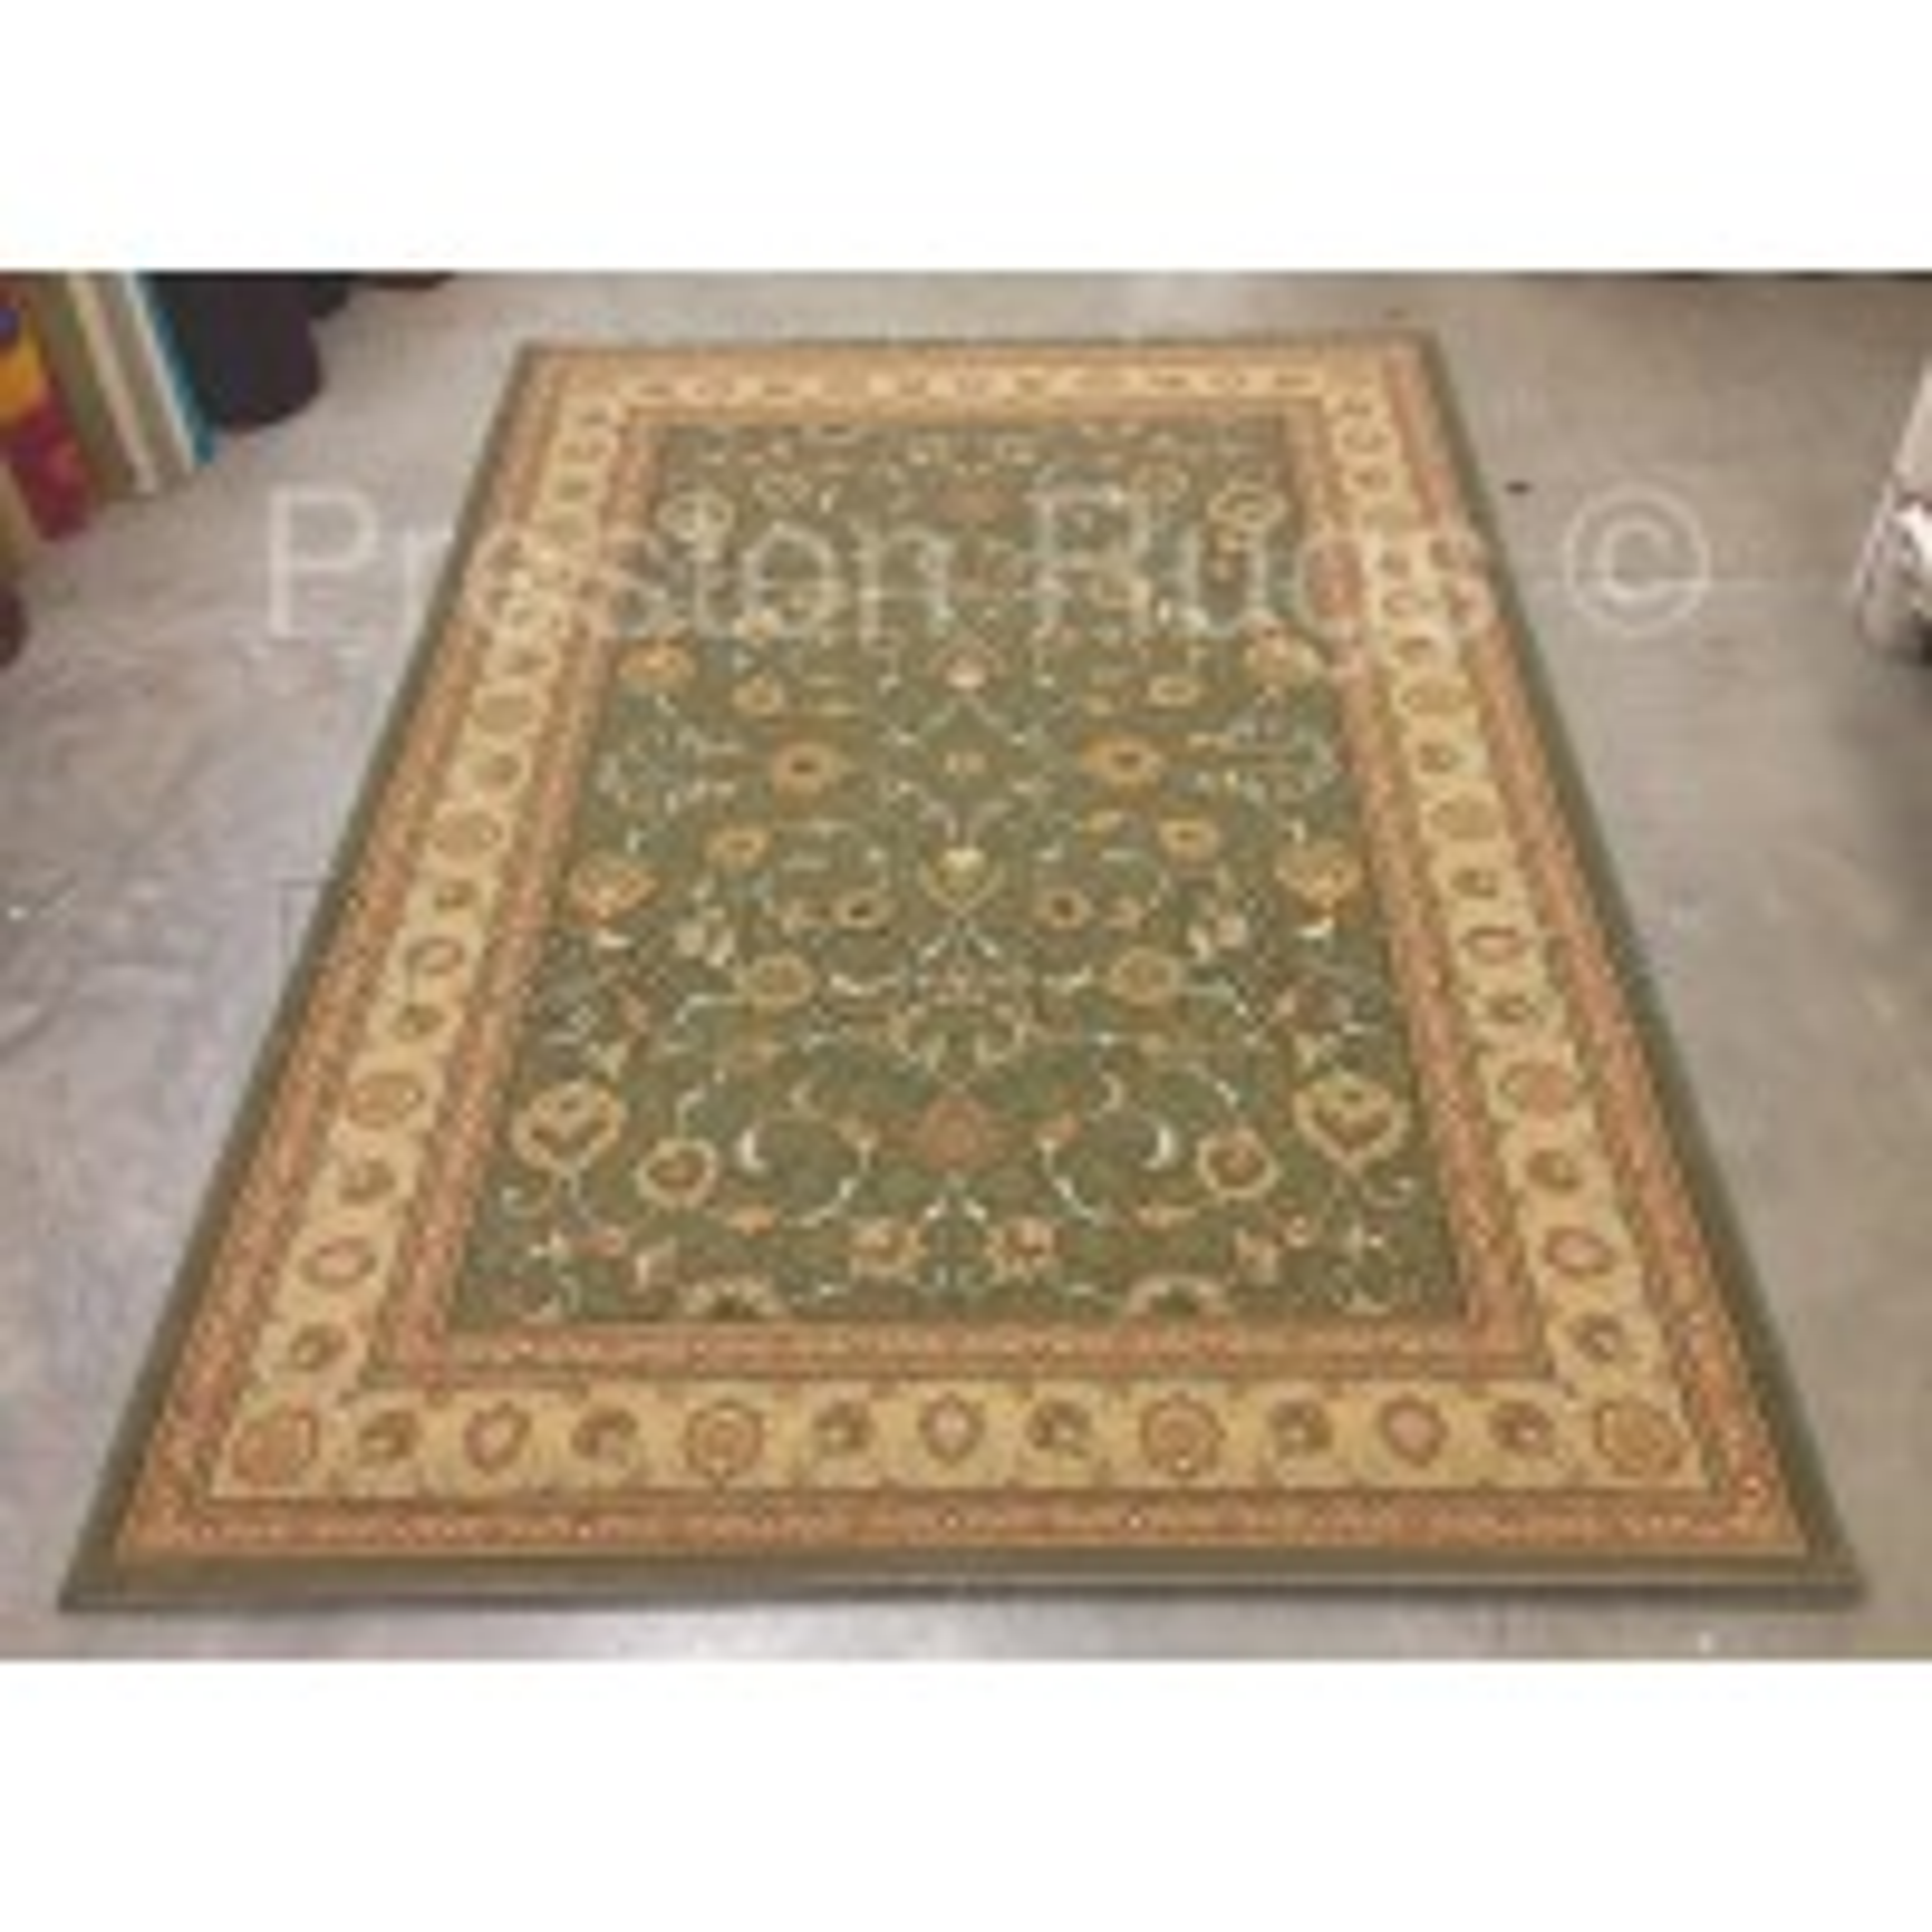 Noble Art Traditional Persian Agra Design Rug - Green Beige Cream 6529/491